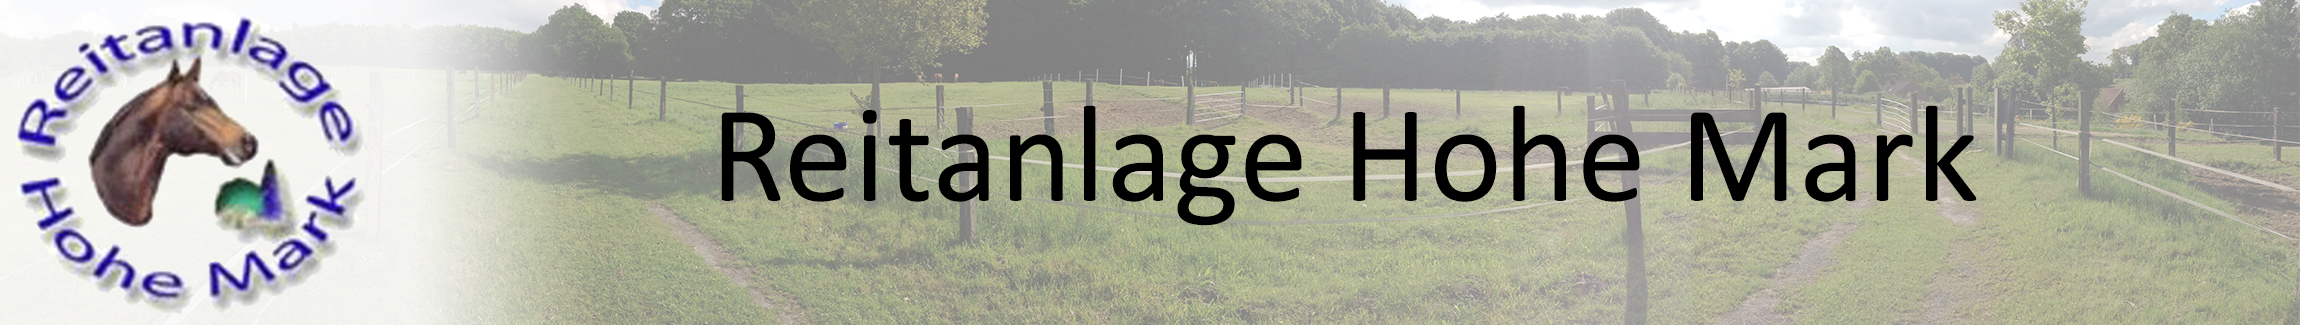 Reitanlage Hohe-Mark